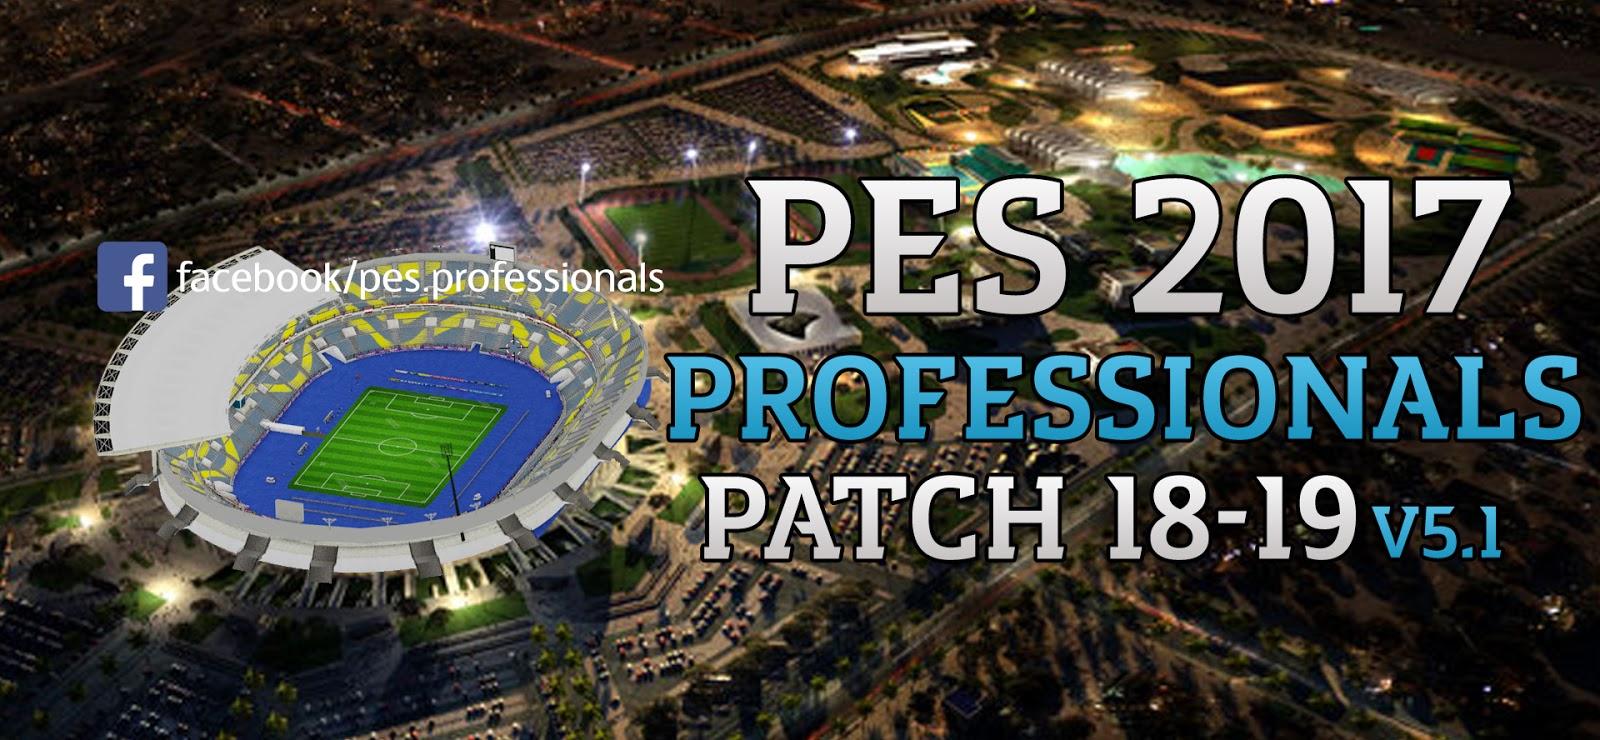 PES 2017 PROFESSIONALS PATCH V5.1